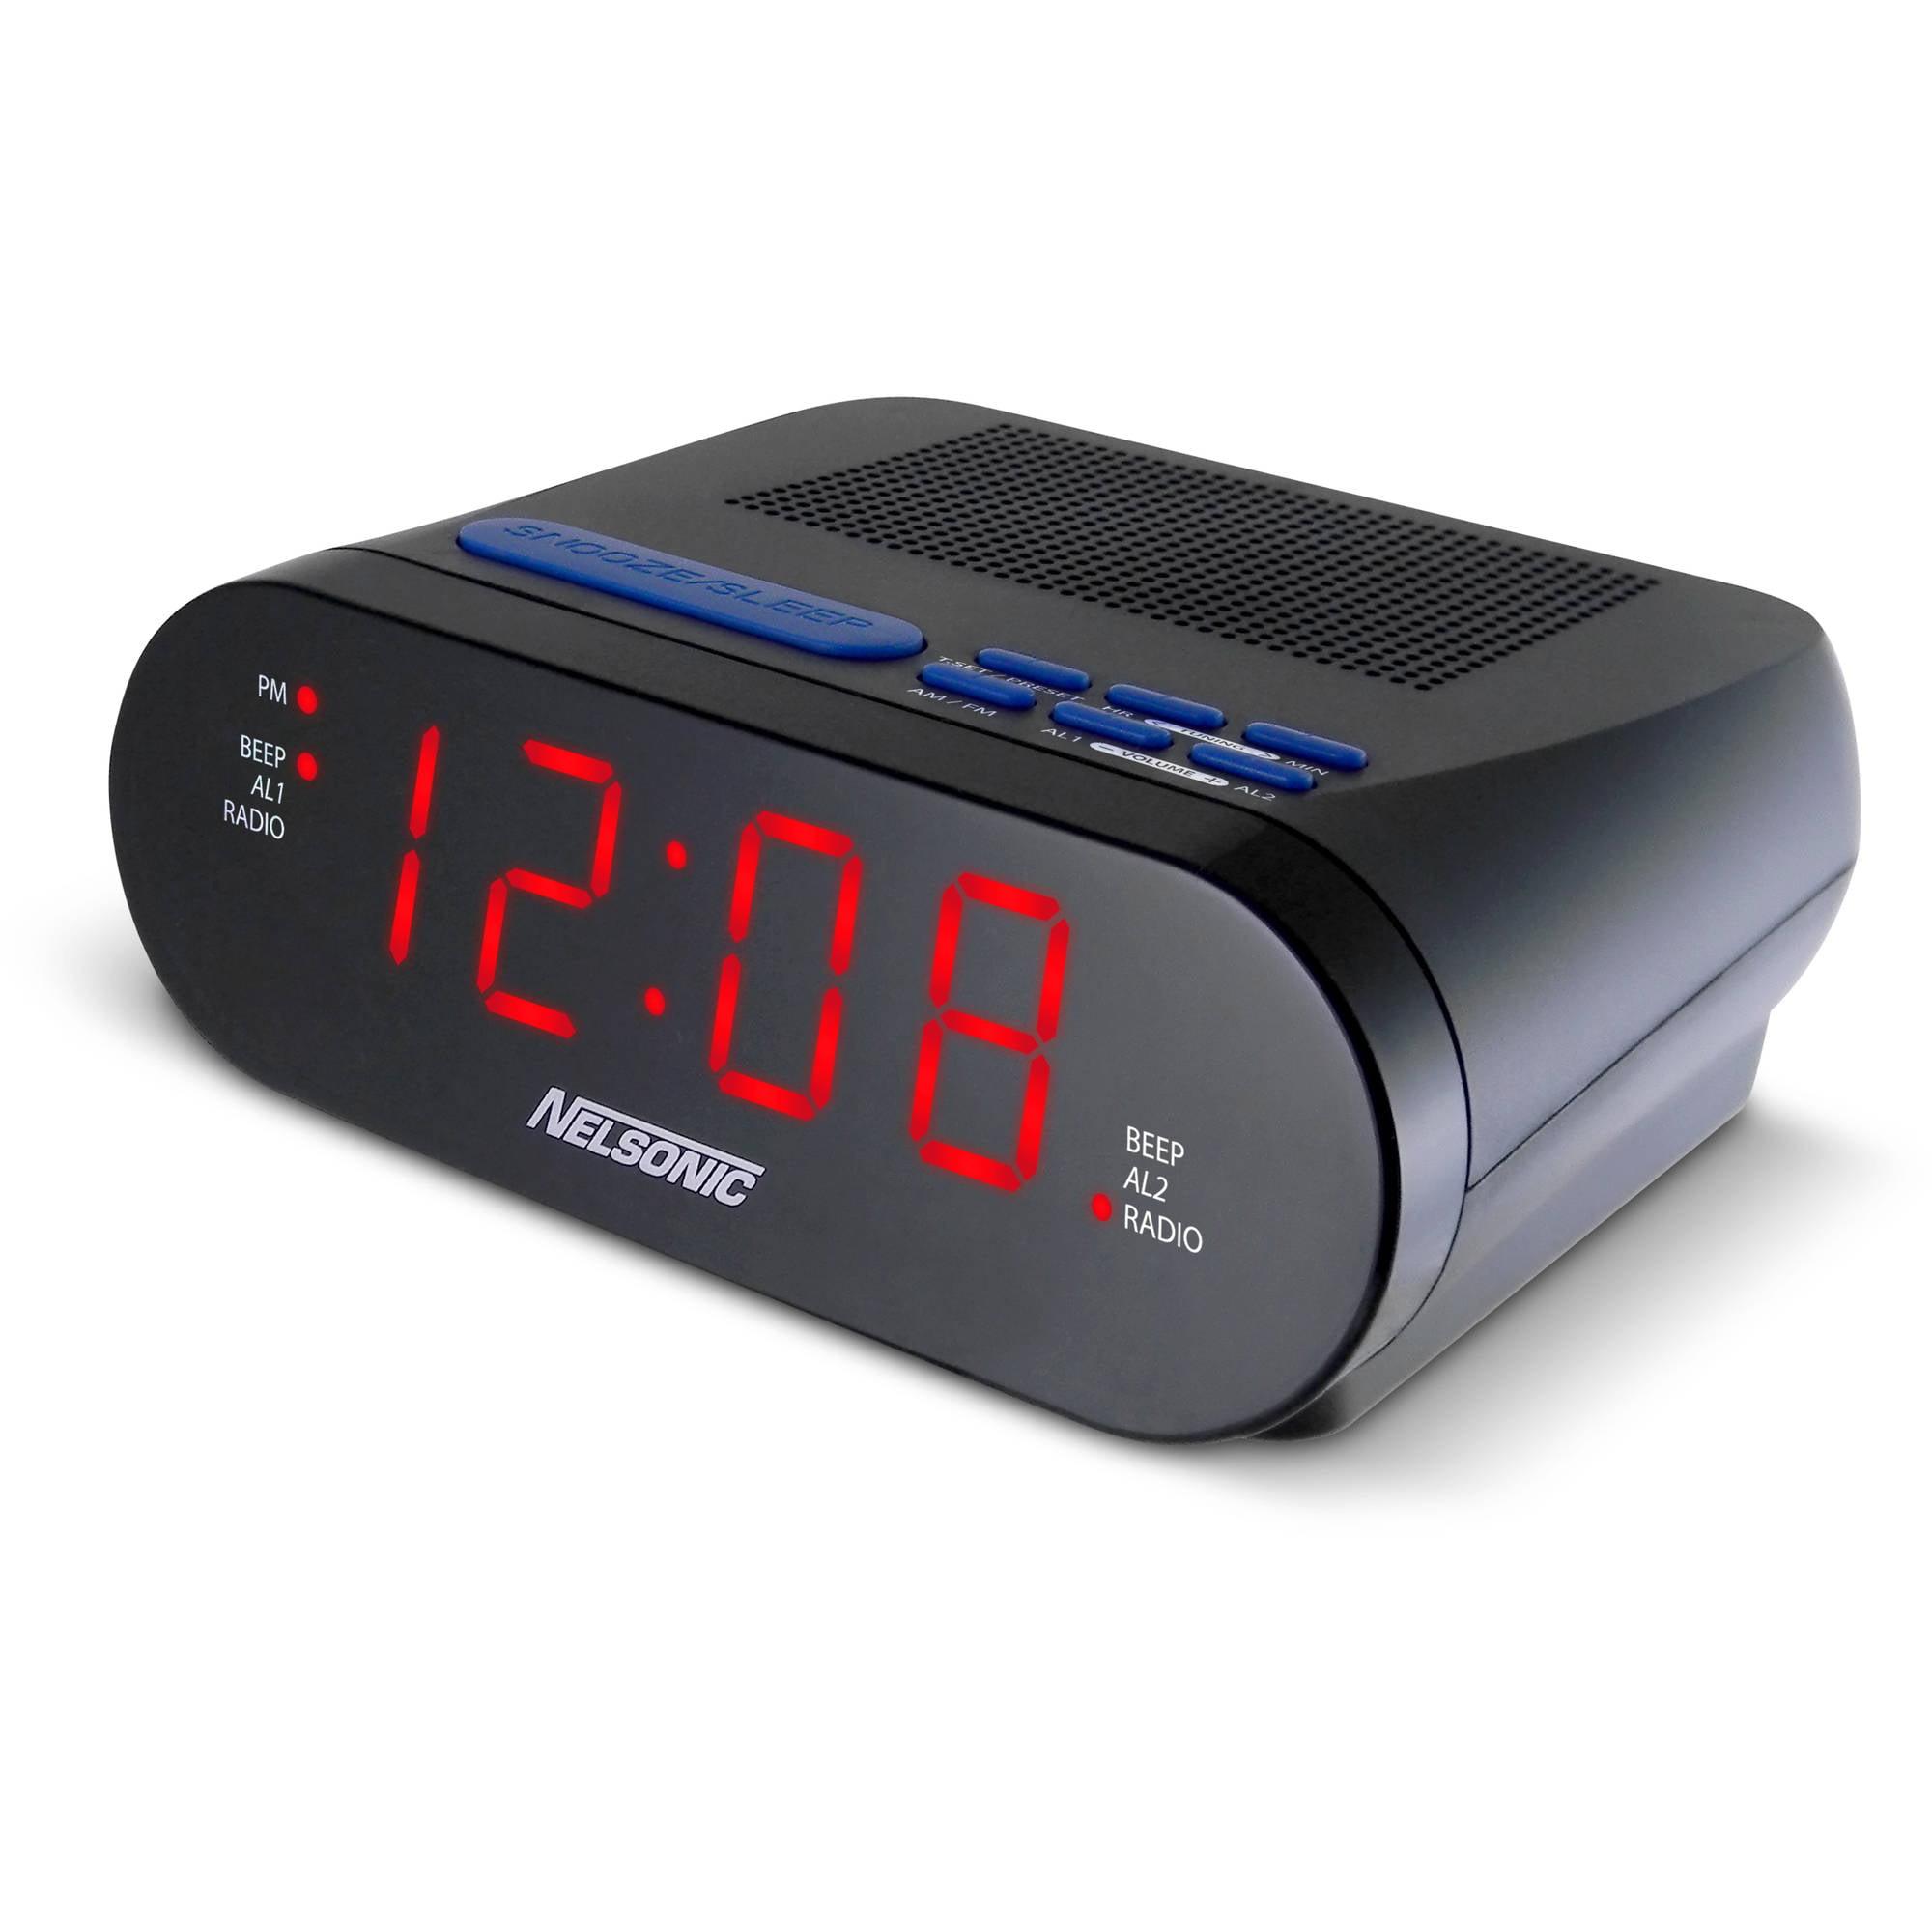 Nelsonic Opp Led Clock Radio With Digital Tuner Walmart